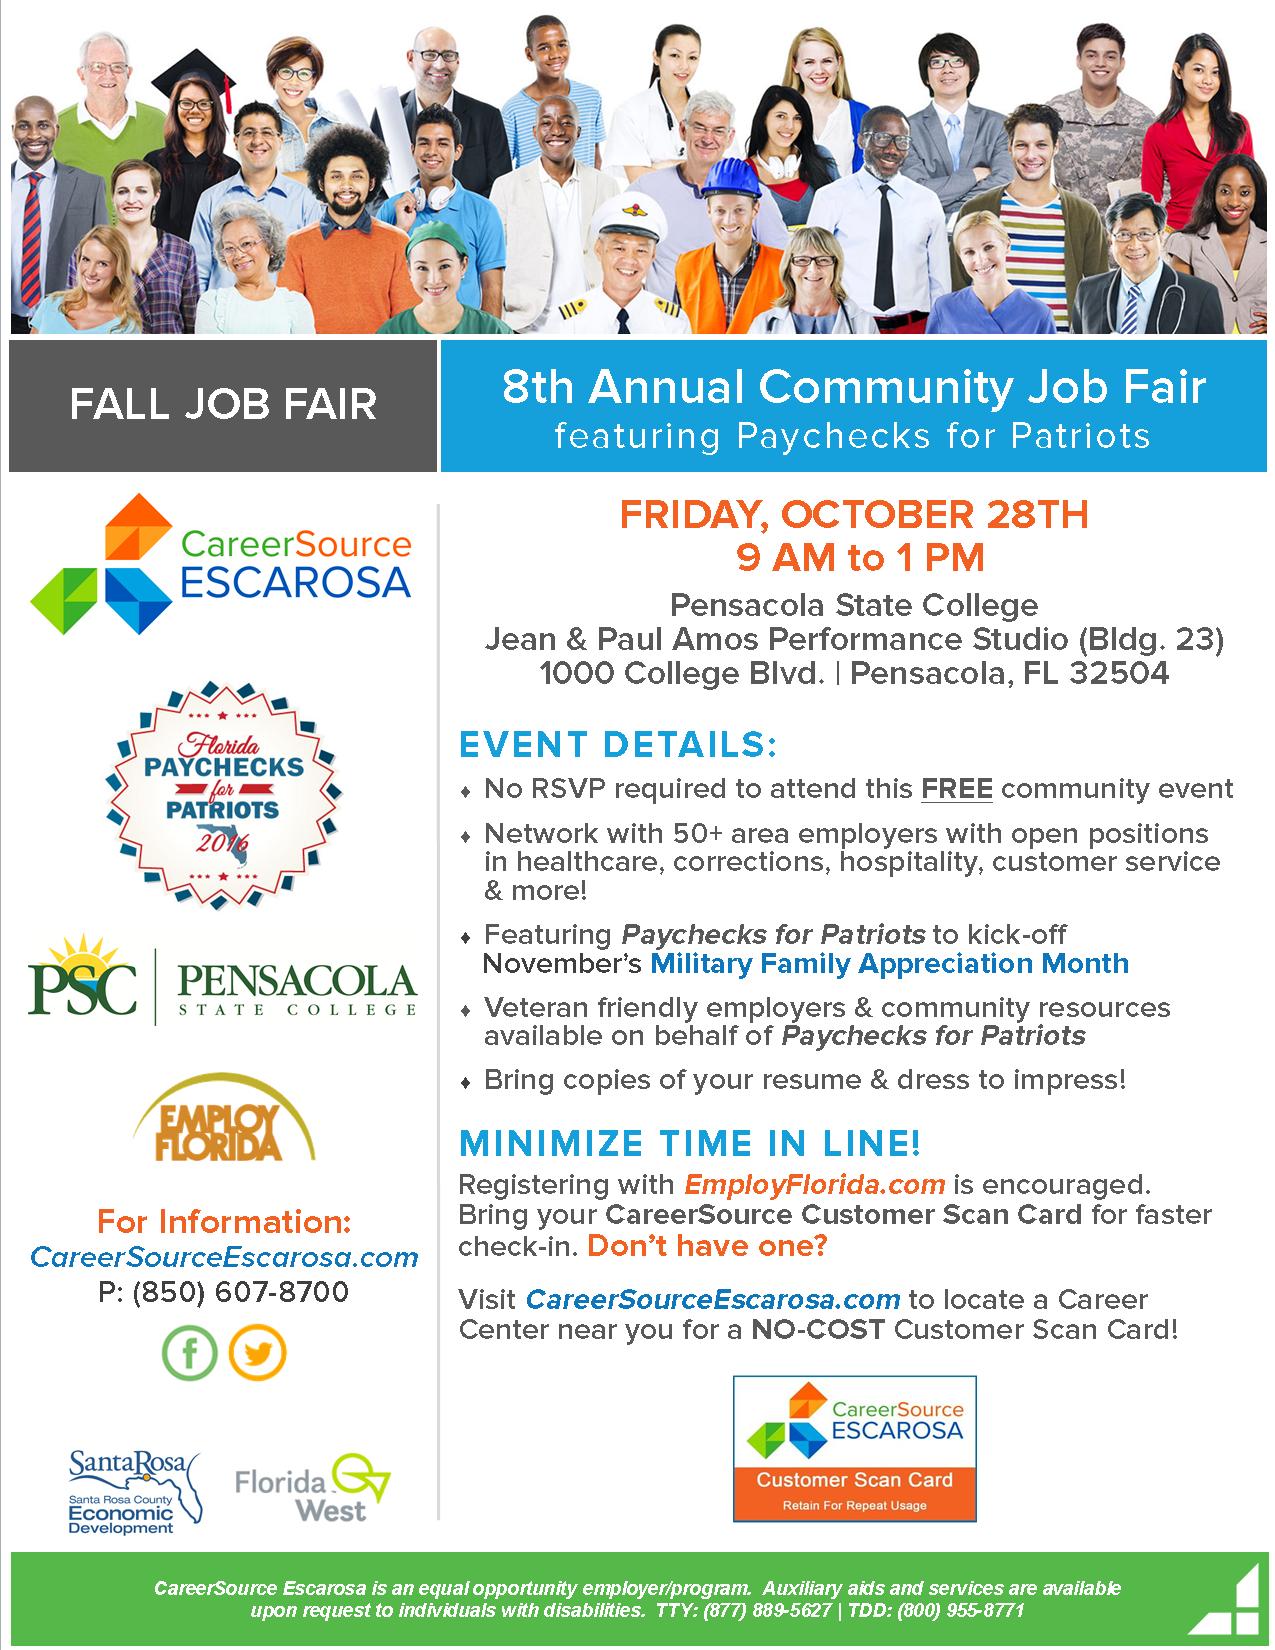 8th Annual Fall Job Fair featuring Paychecks for Patriots (October 28, 2016)